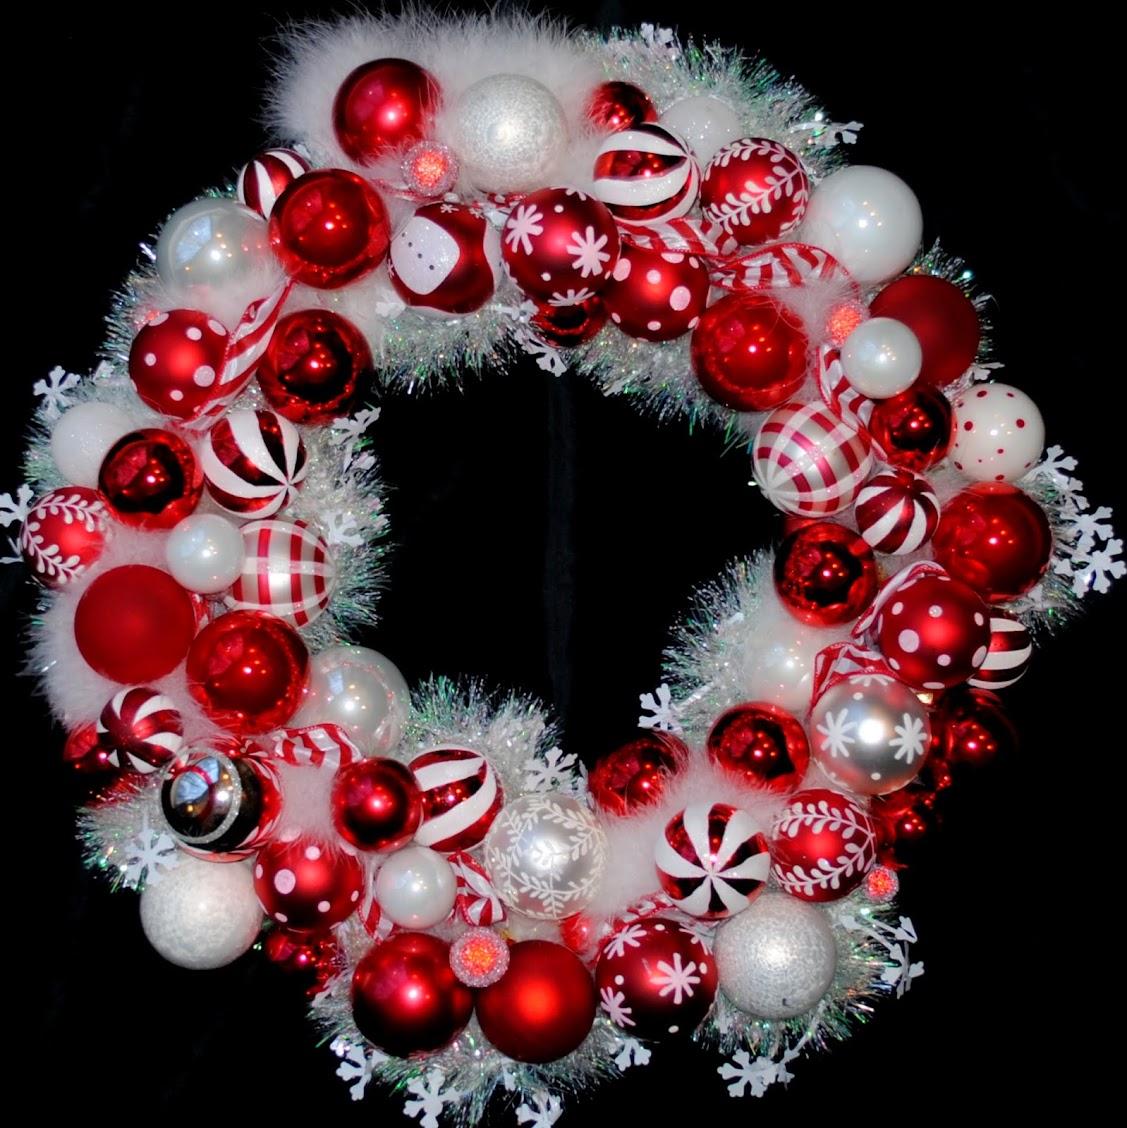 Peppermint Swirl Vintage Ornament Wreath OWR8006